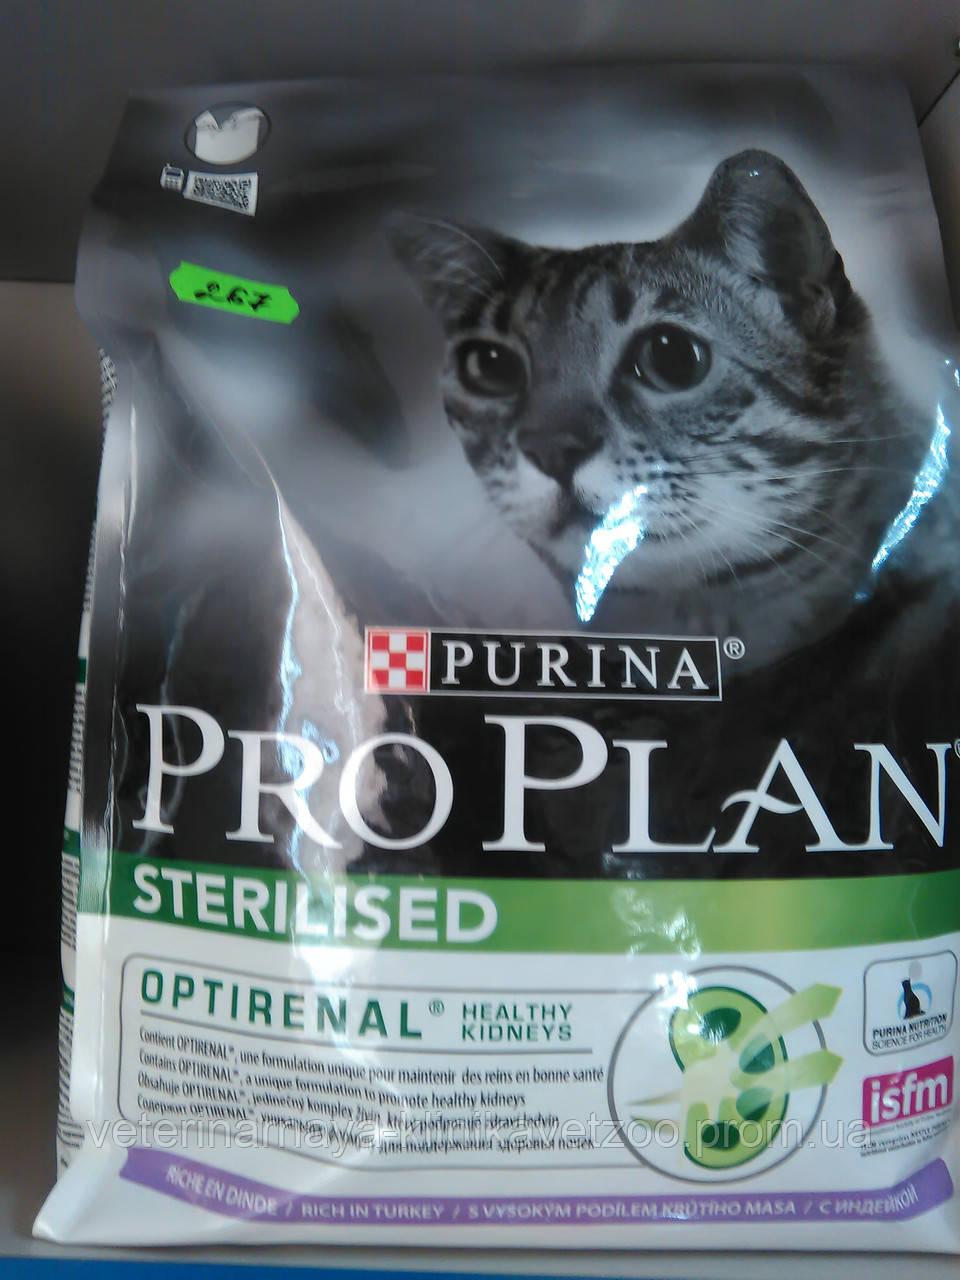 Pro Plan(sterilised)корм для стерилизованных кошек премиум класса1,5кг.